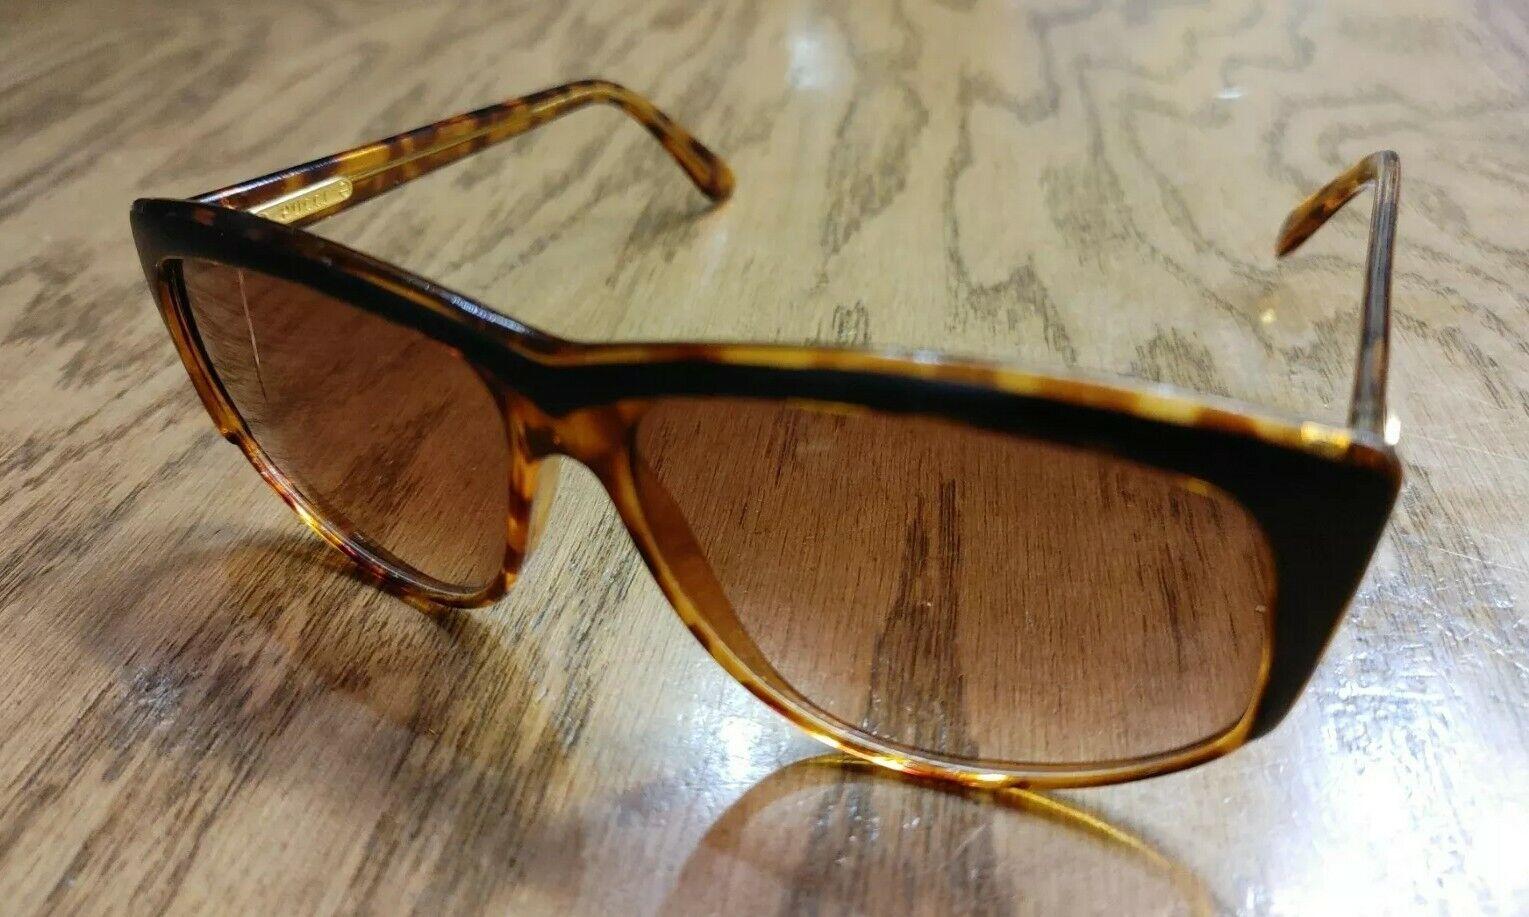 Emilio Pucci 873-8 EP 03 Tortoise Flat Black Top Sunglasses Small Crack on Lens